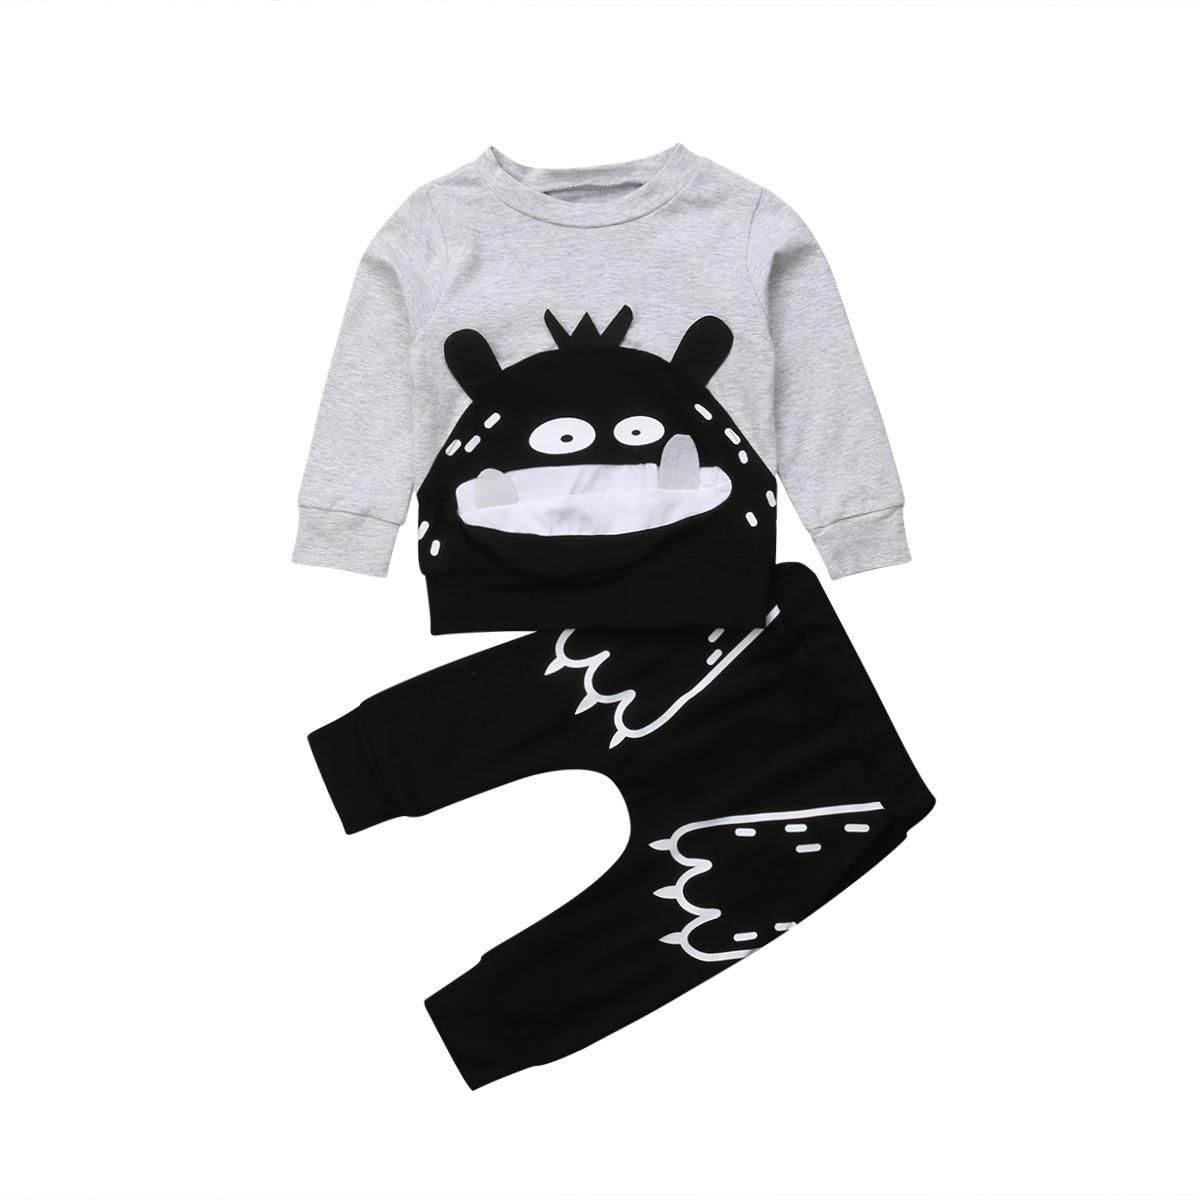 Cartoon Monster Clothes Set Toddler Baby Girl Outfit Long Sleeve Tops Sweatshirt Coat Pants 2019